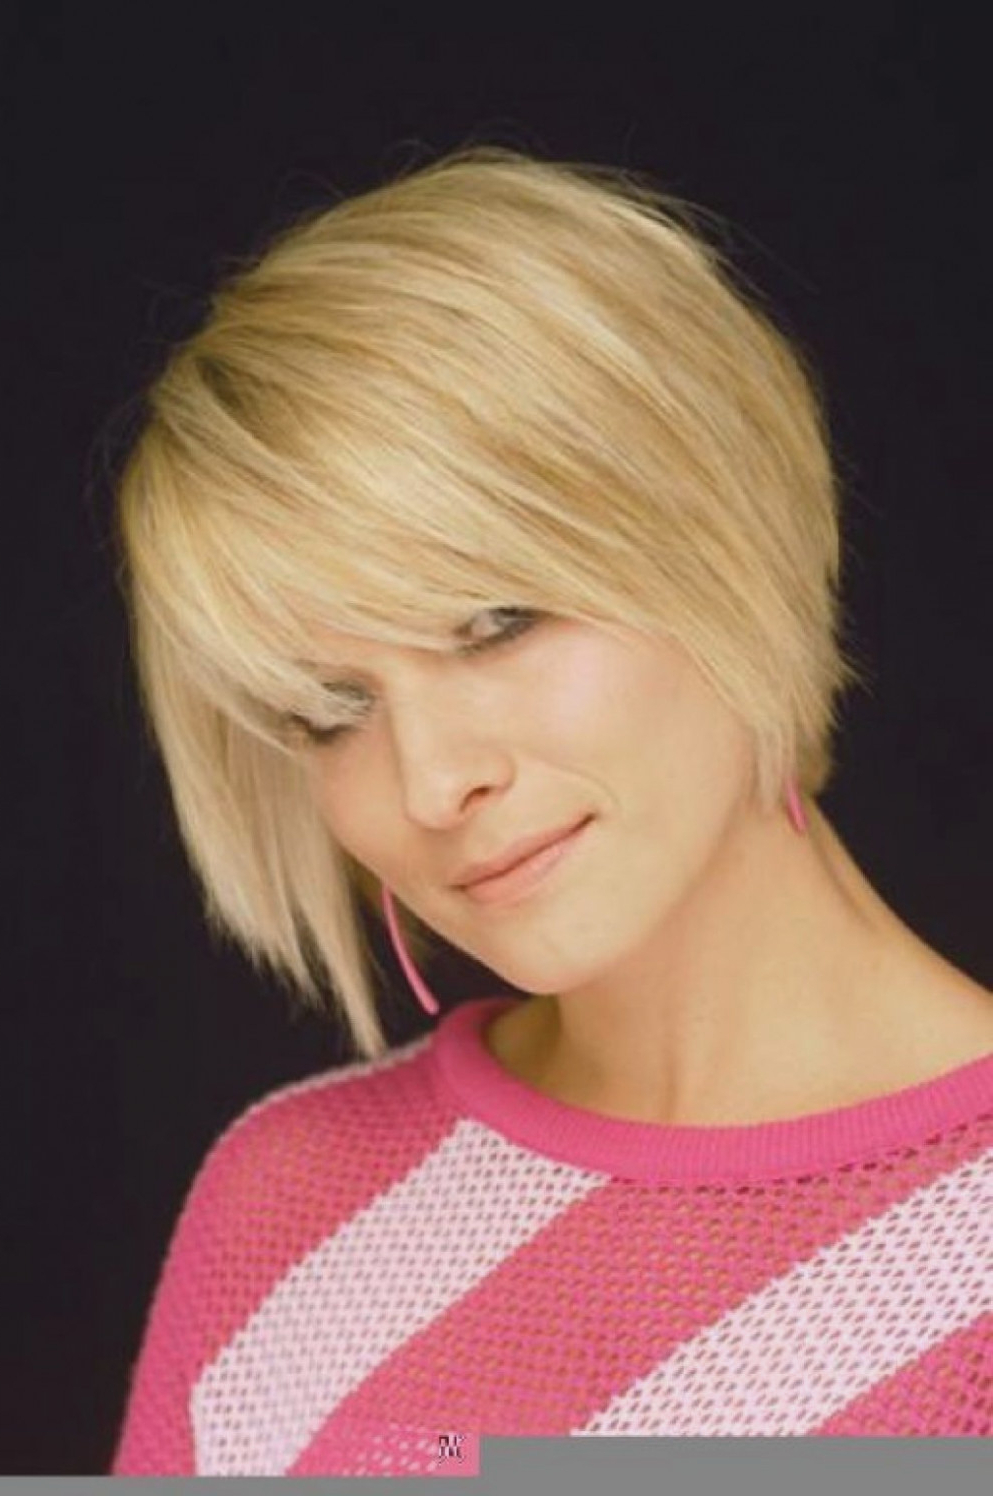 Beautiful Medium Short Hairstyles For Thin Hair Gallery Styles Within Medium To Short Haircuts For Thin Hair (View 13 of 25)